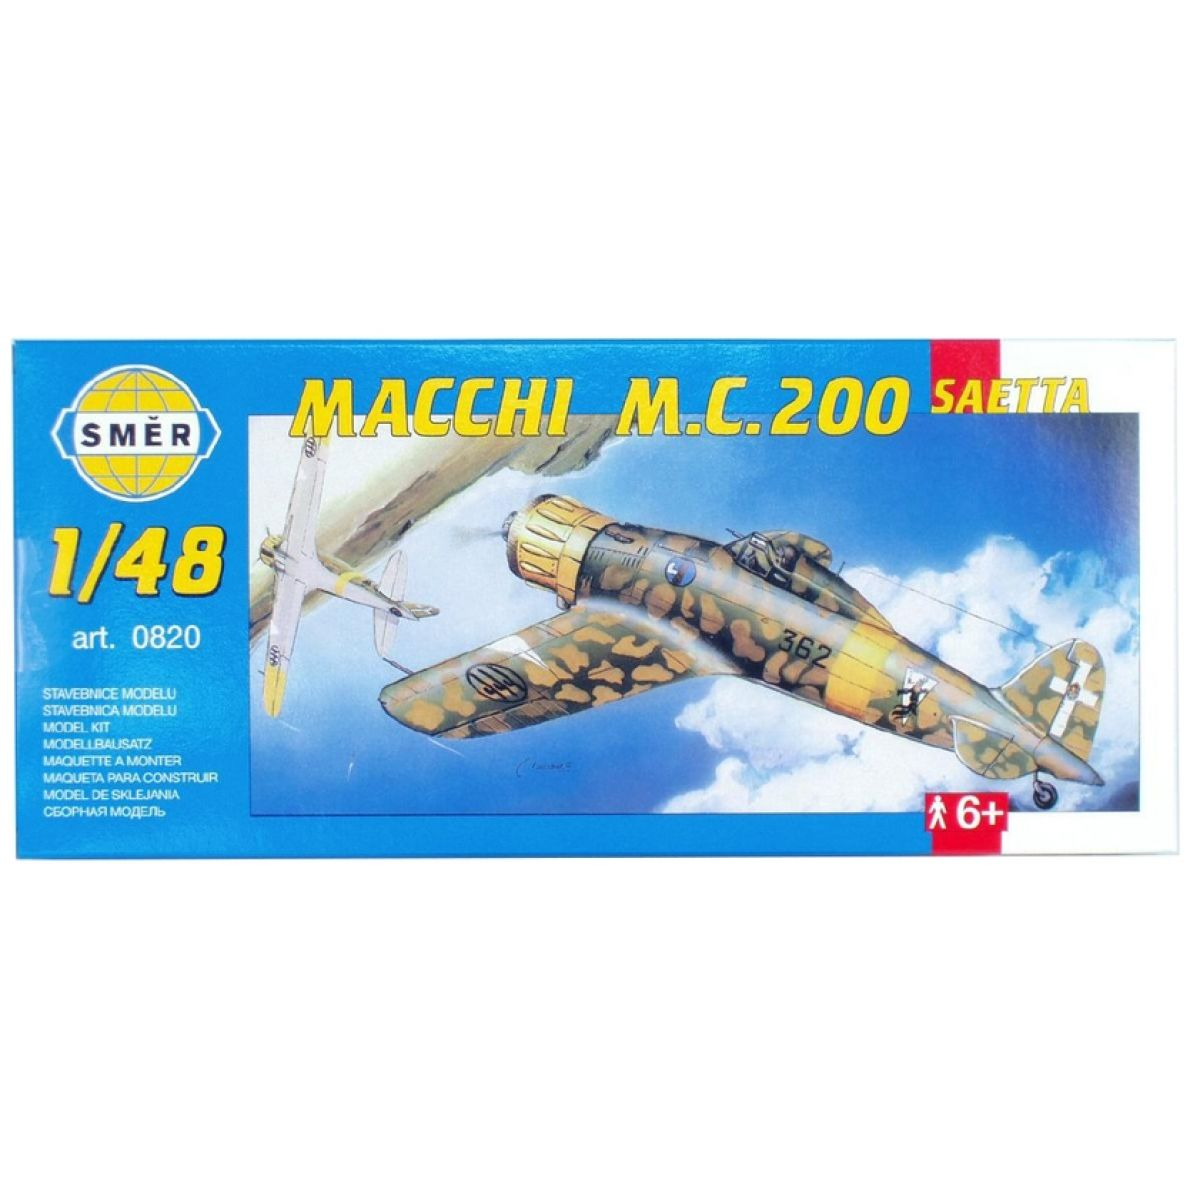 Směr Model Macchi M.C. 200 Saetta